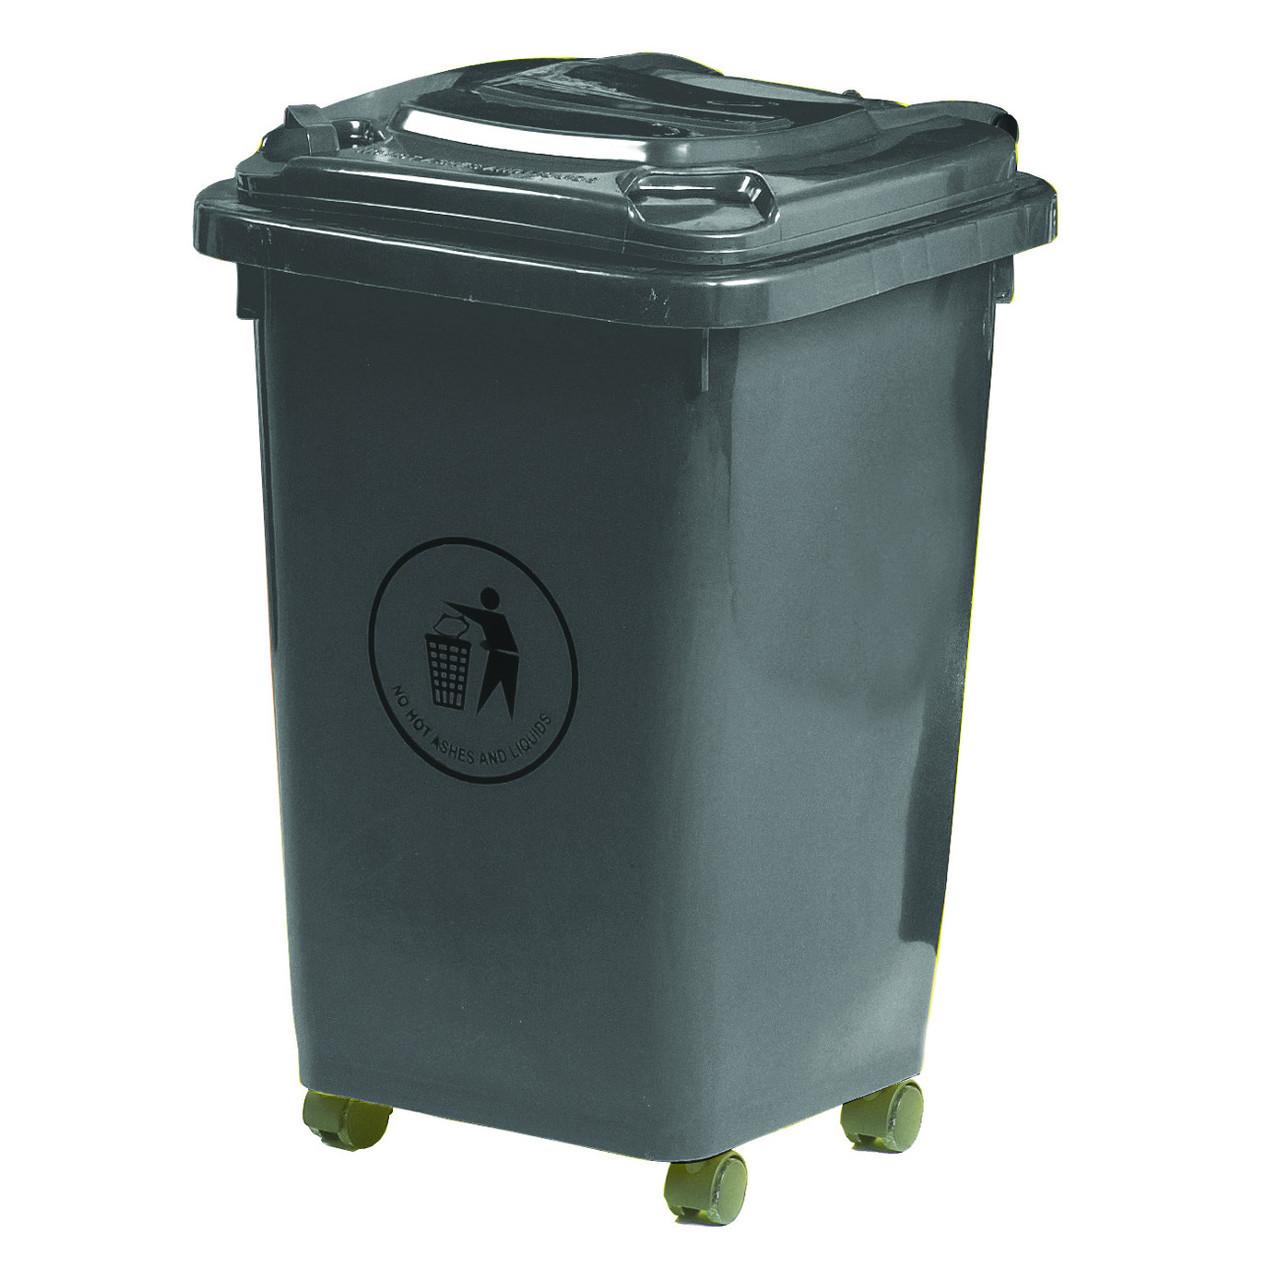 50L Wheeled Litter Bin - Dark Grey